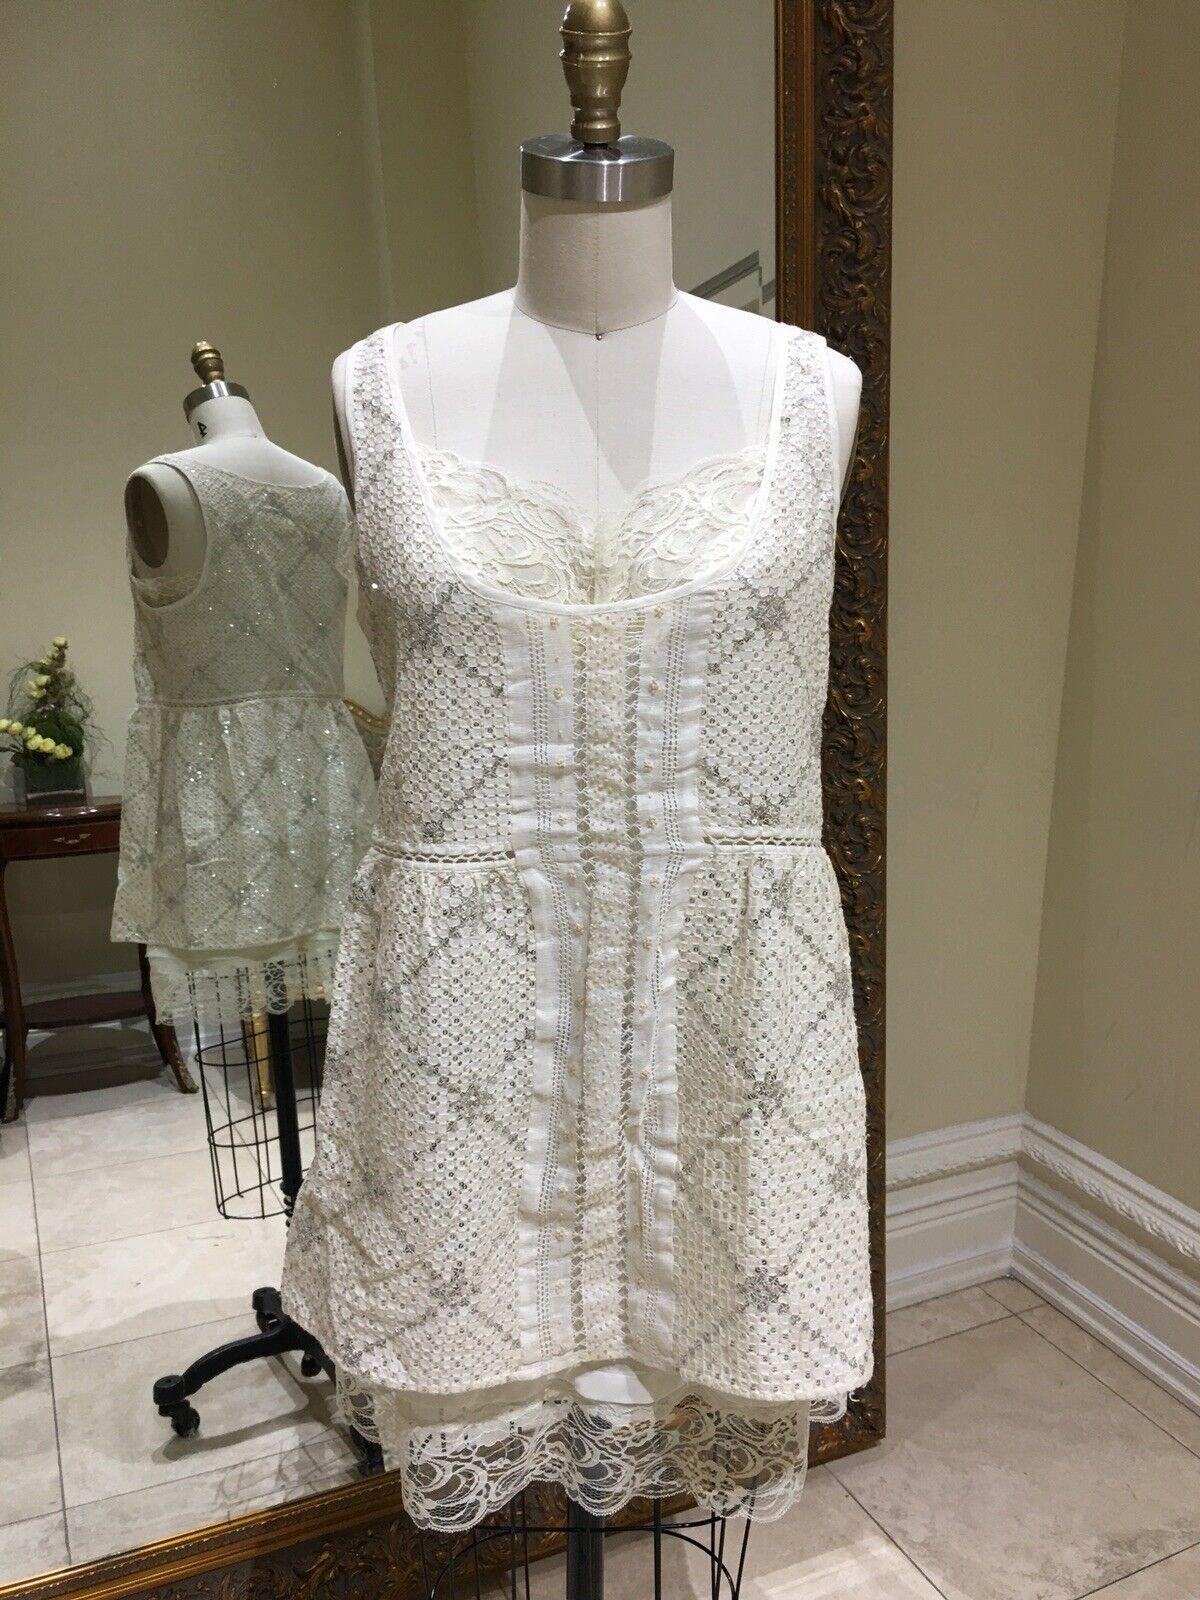 By Francine Bohemian Crochet Sequin Lace Slip With Shift Dress Größe S M